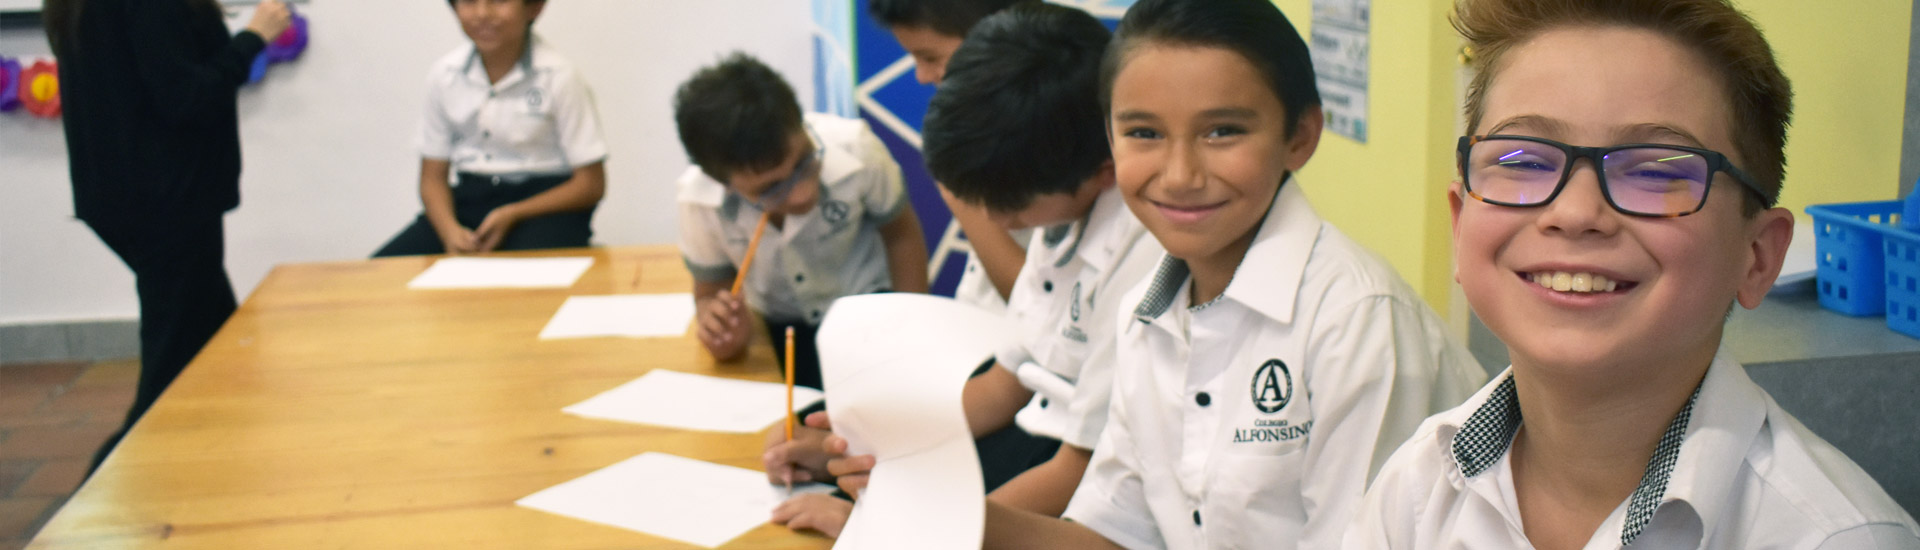 Elementary Colegio Alfonsino